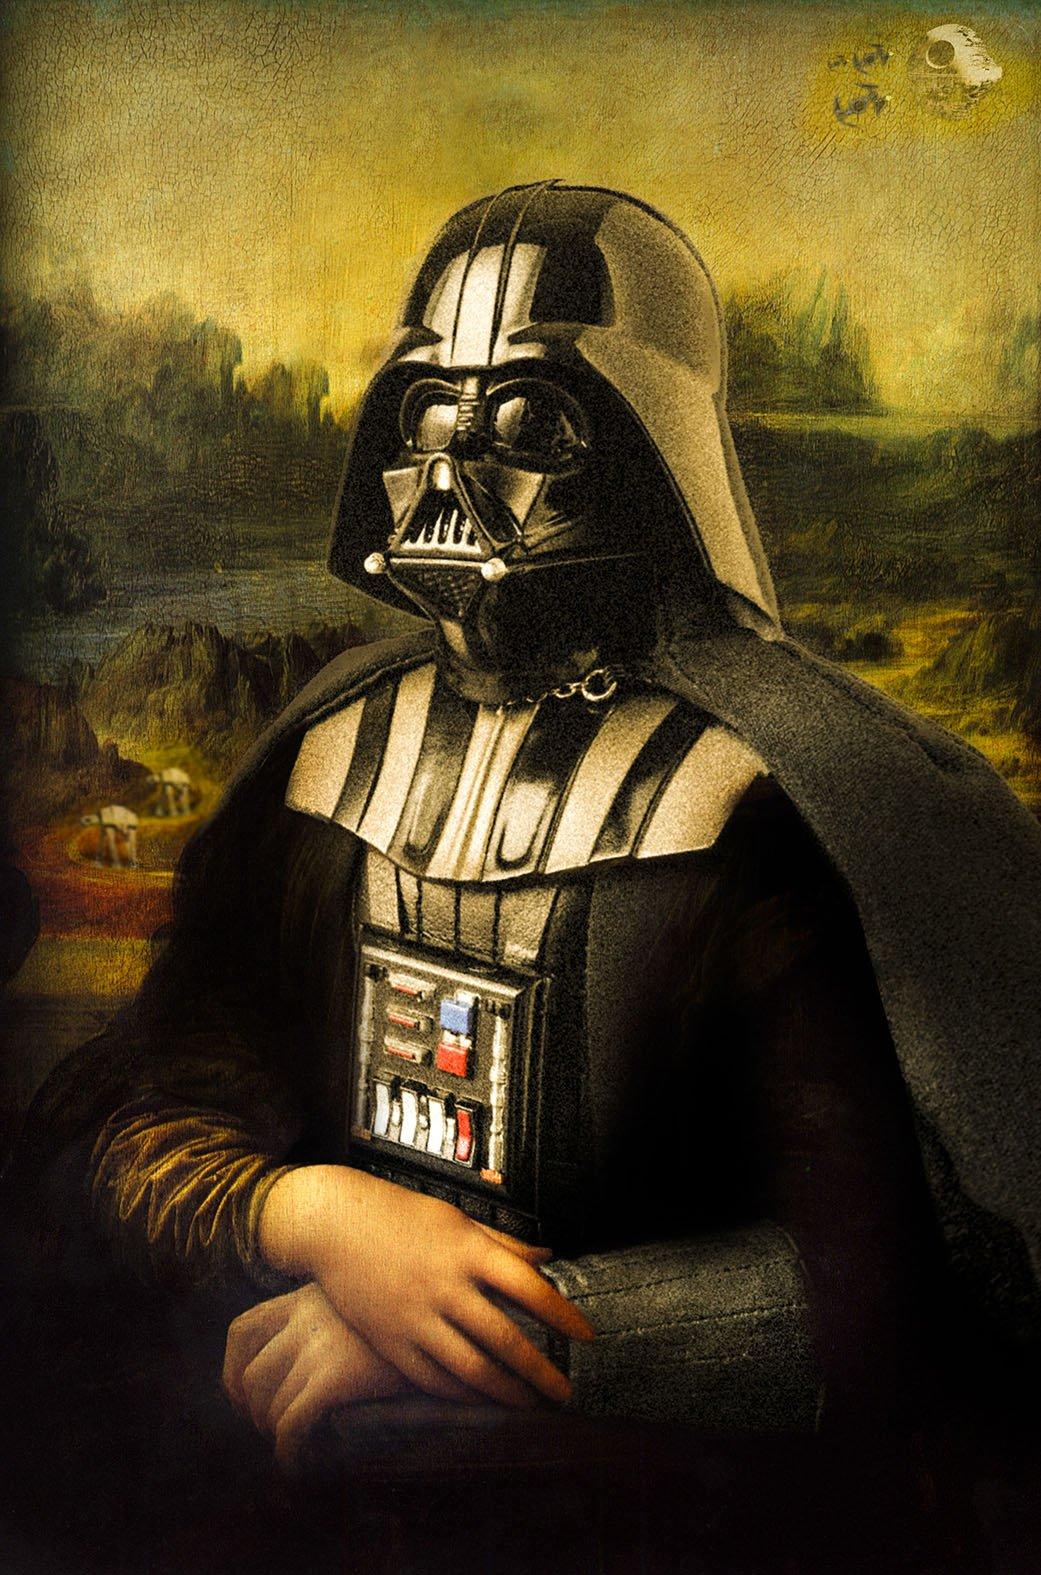 Mona Lisa Darth Vader Canvas Print Star War Art Wall Art